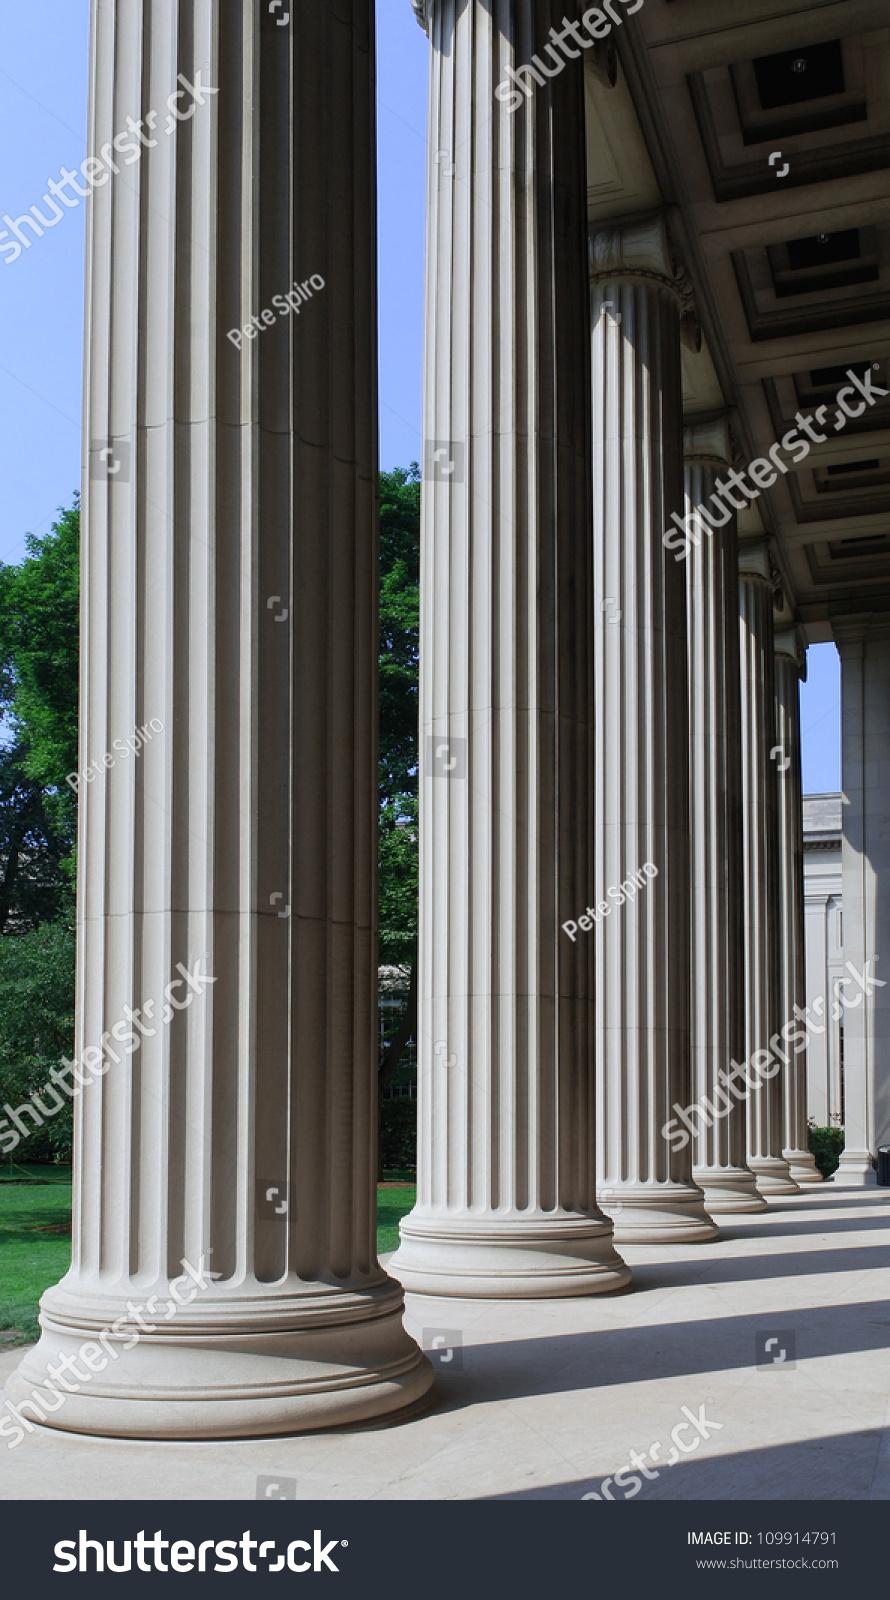 Building Stone Pillars : University building stone columns stock photo